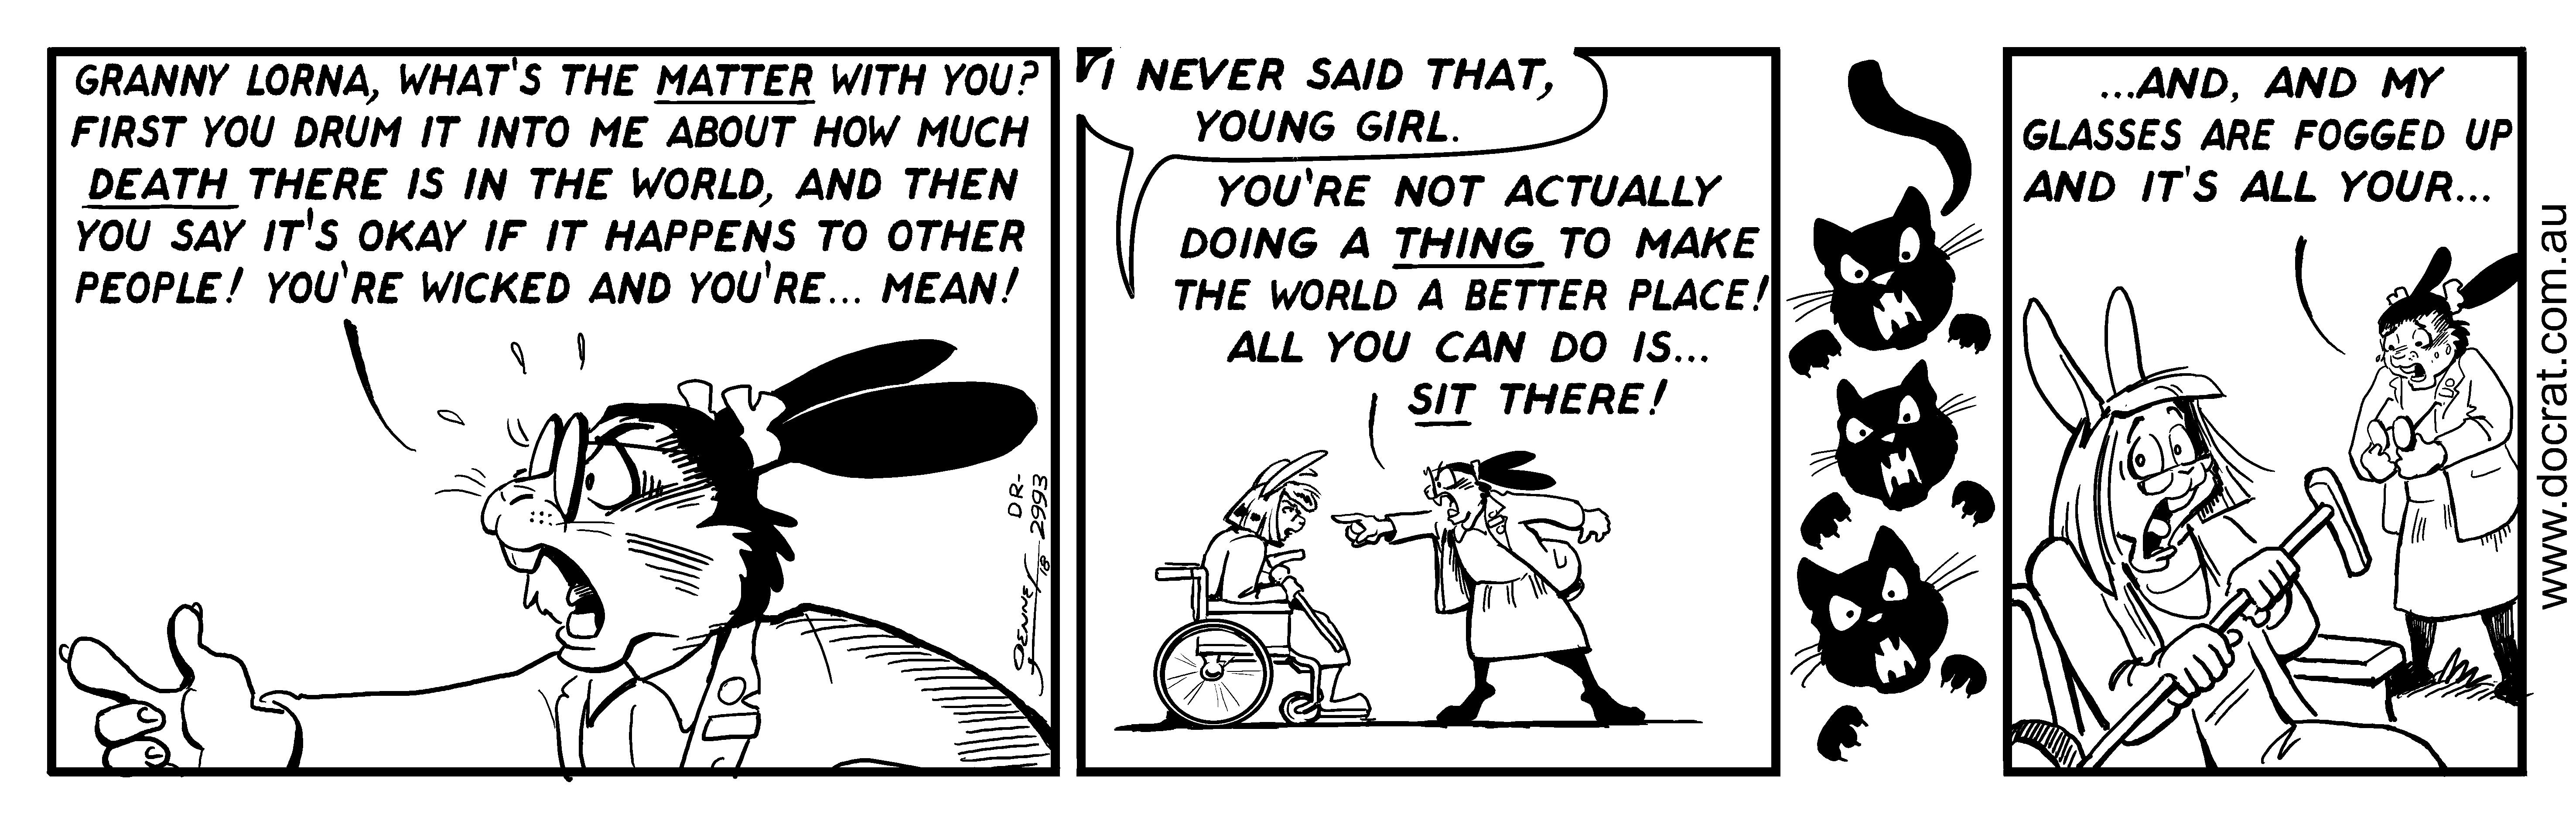 20180404